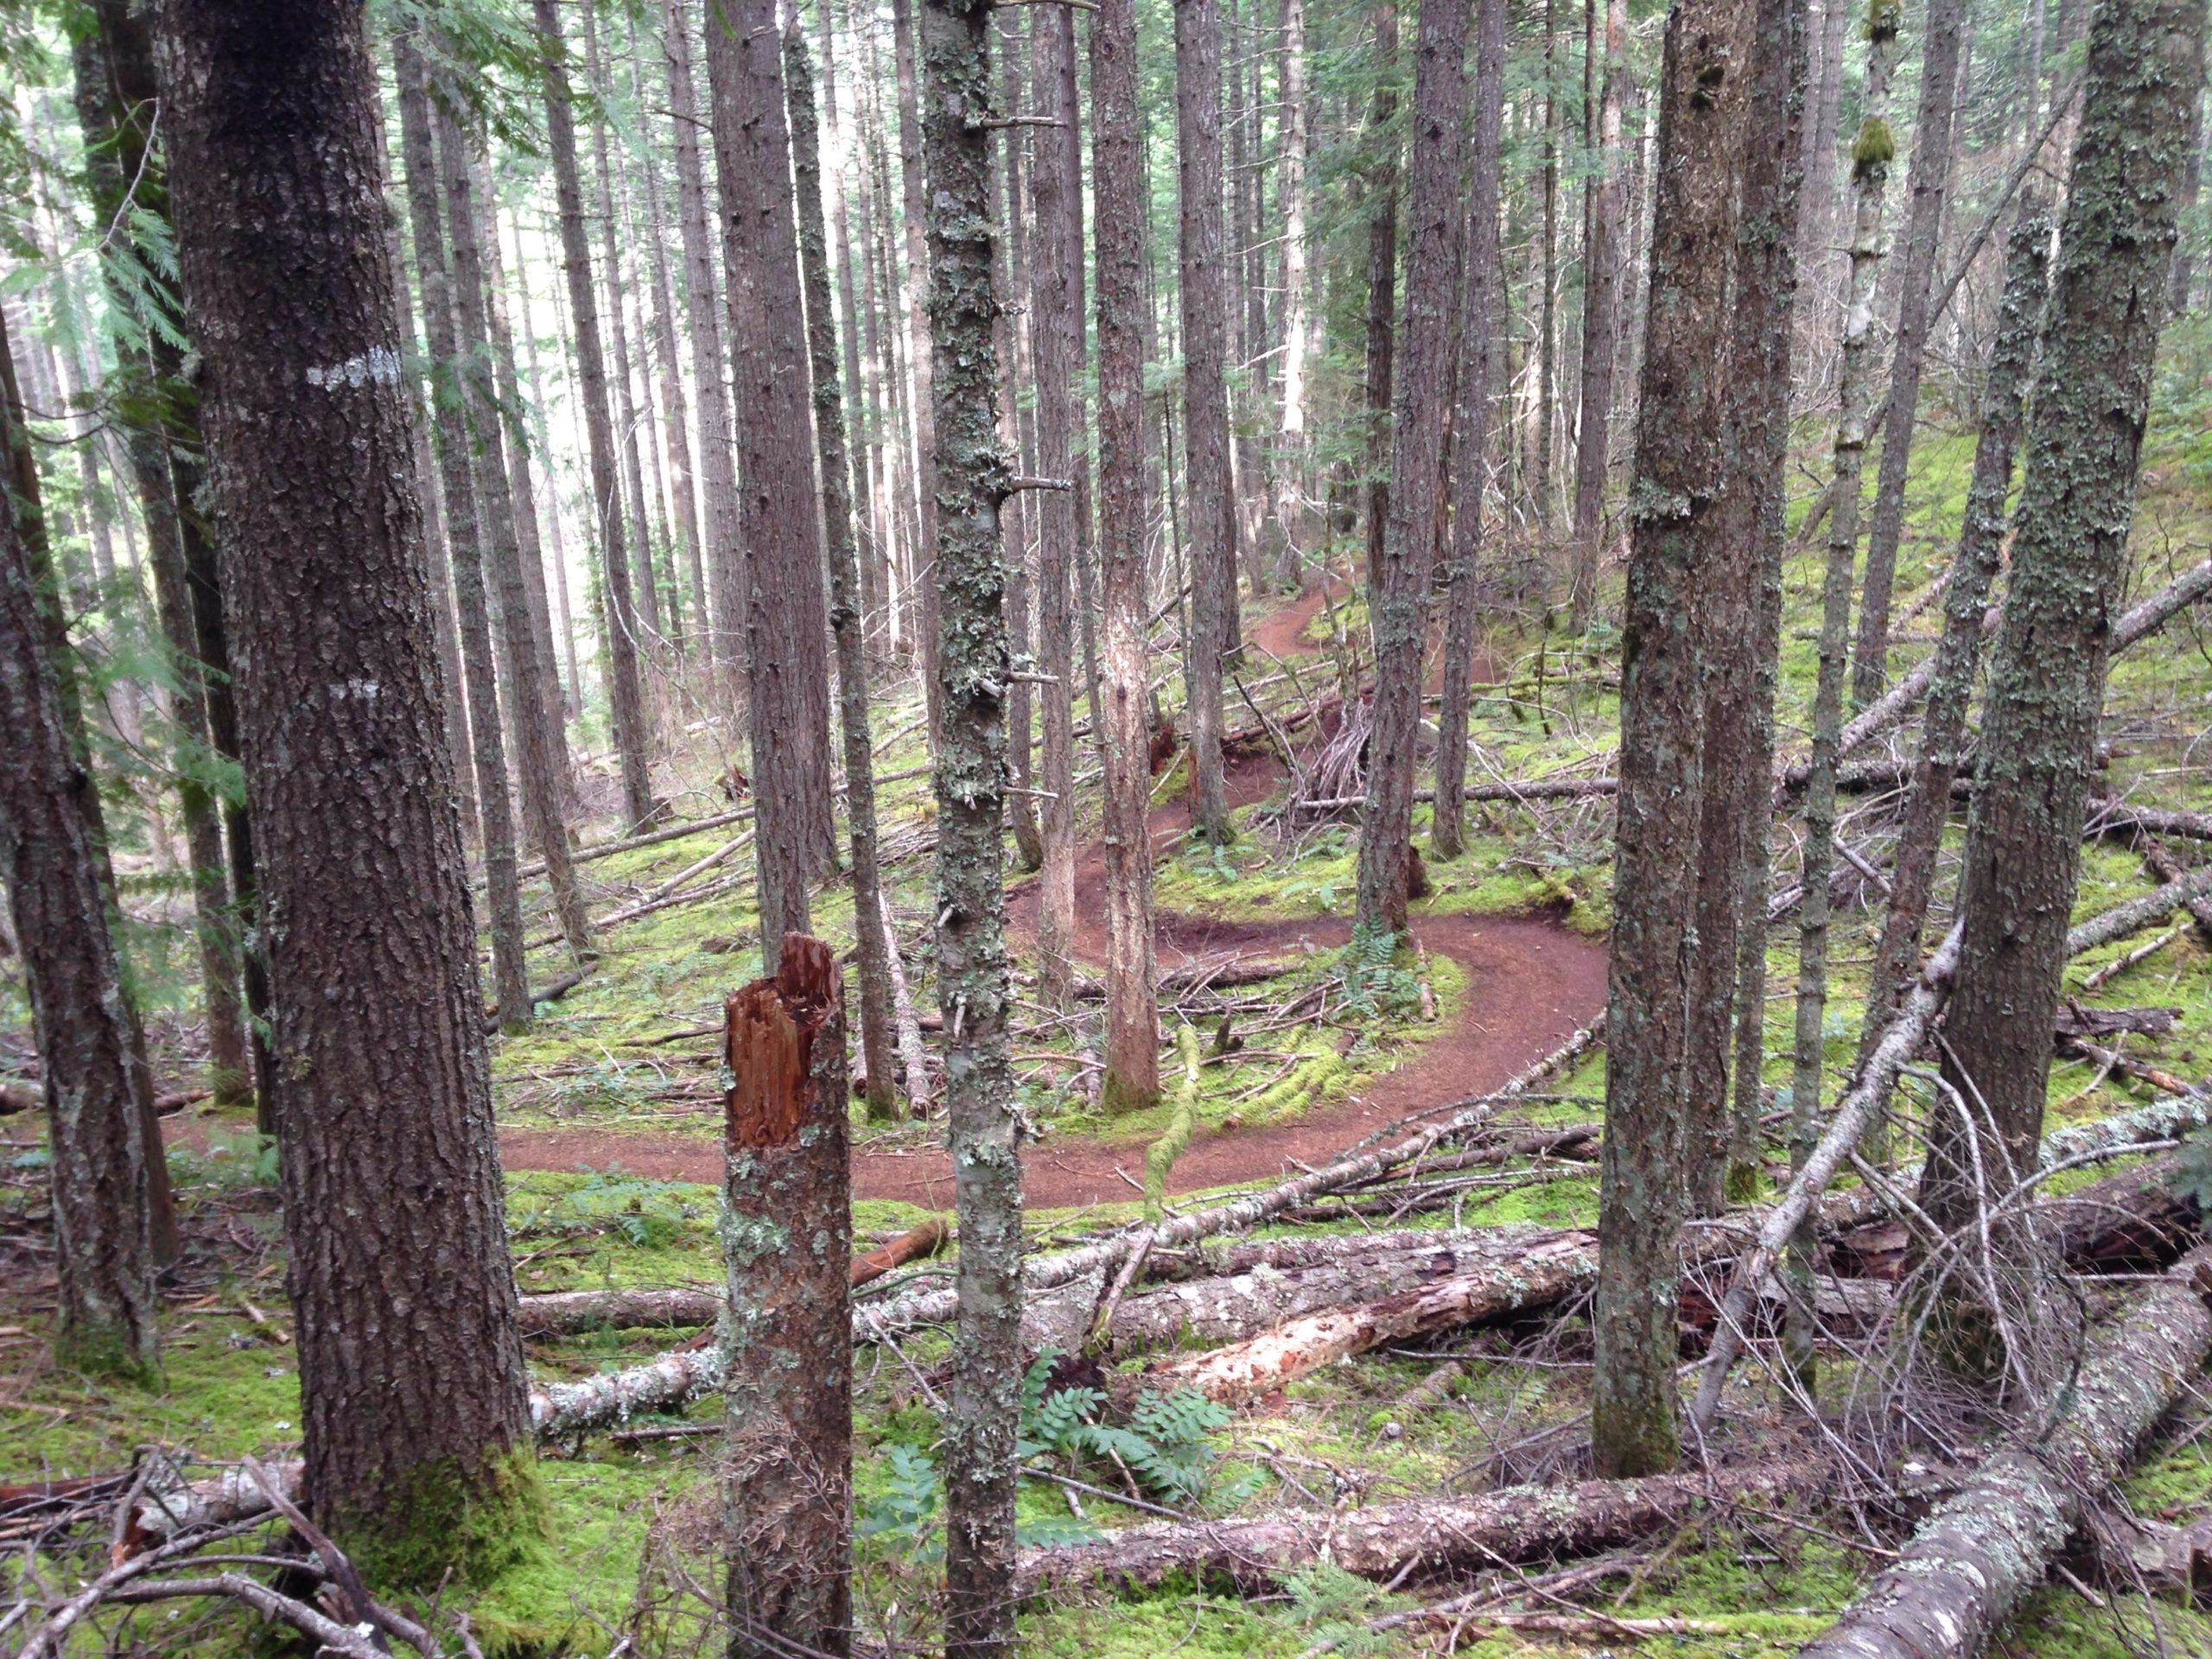 Hood River County in Oregon Re-opens Trails to the Public Following Coronavirus Shutdown - Singletracks Mountain Bike News